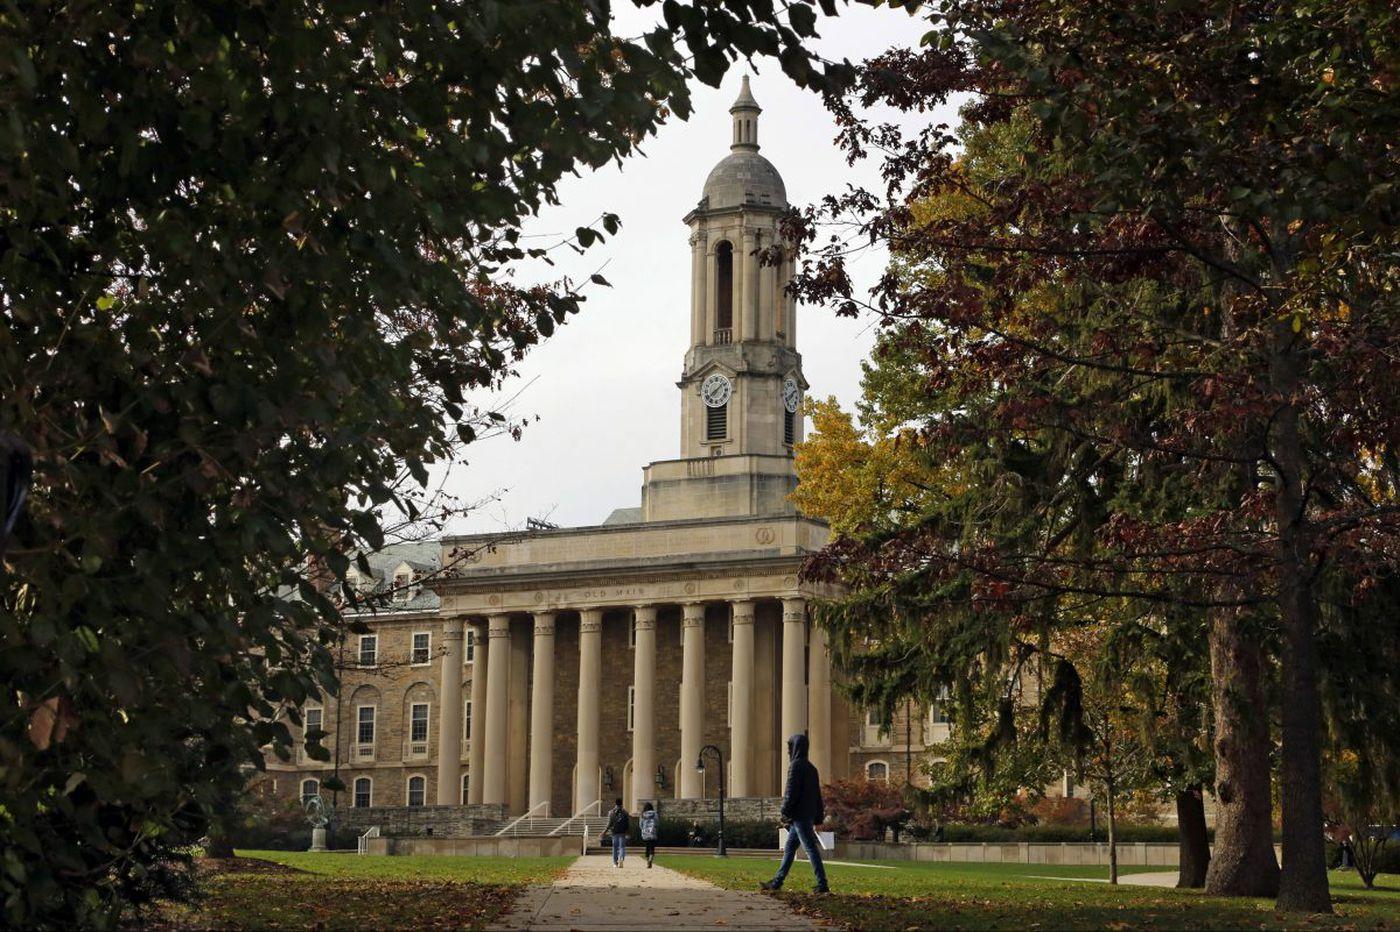 Pa. labor board: Penn State graduate assistants can unionize